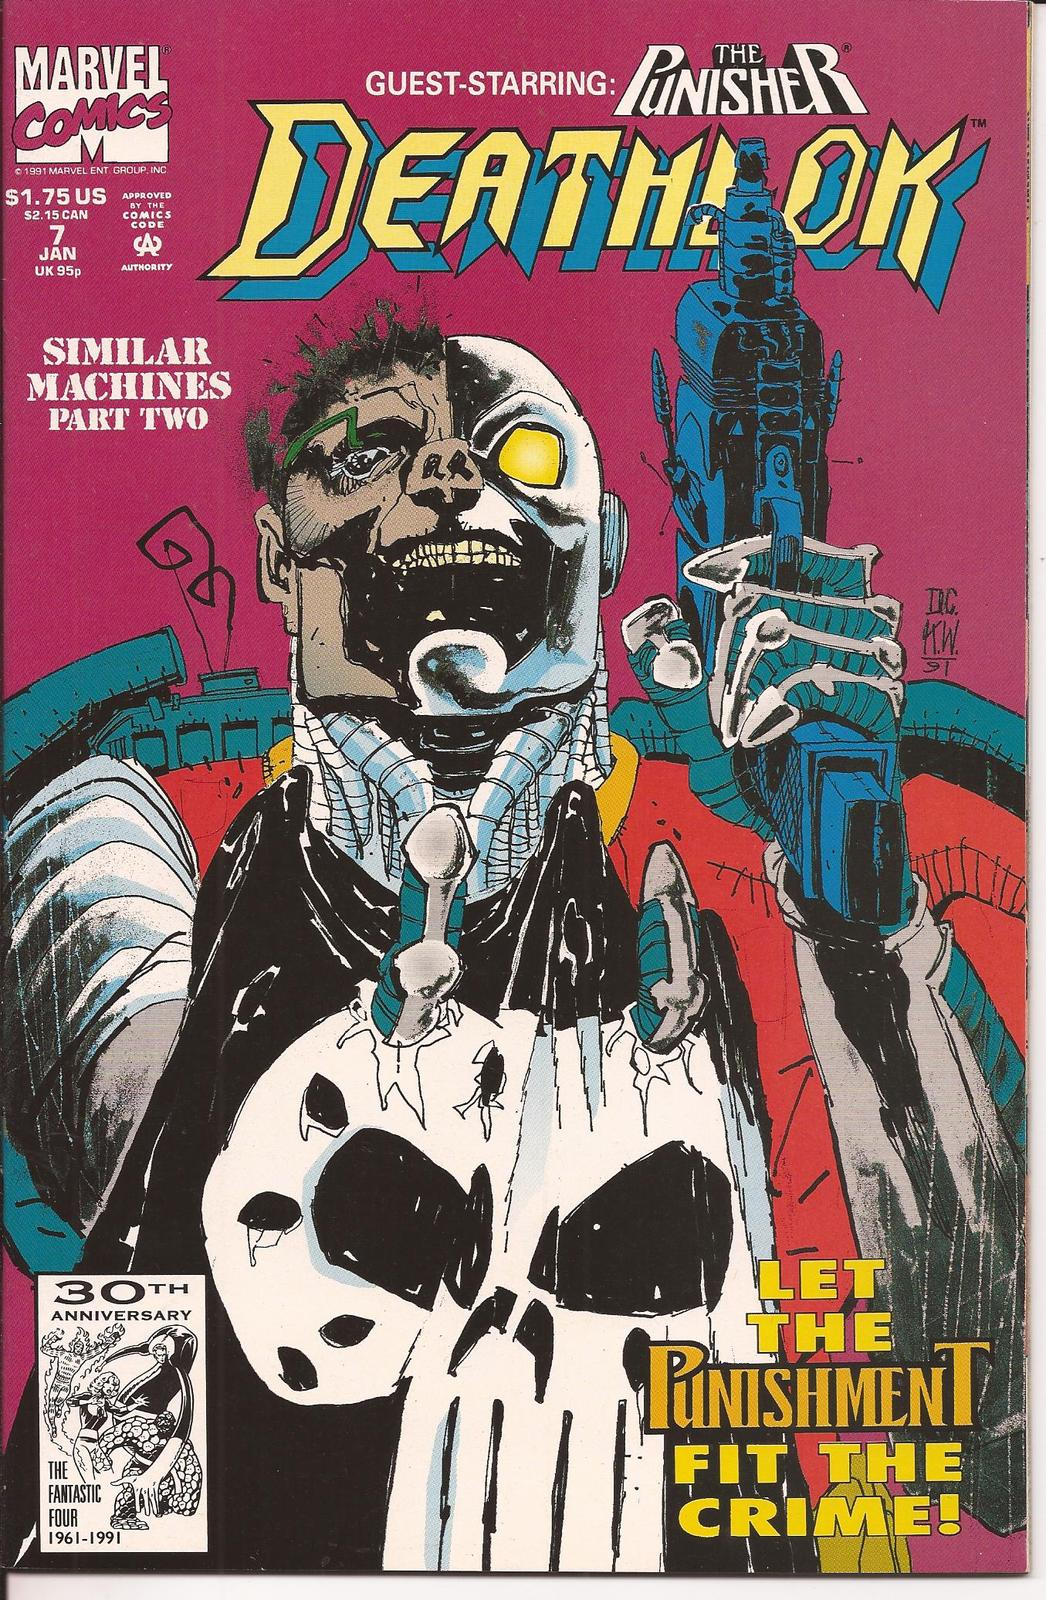 Marvel Deathlok Lot Issues #6,7 & 19 Cyberwar The Punisher Action Adventure